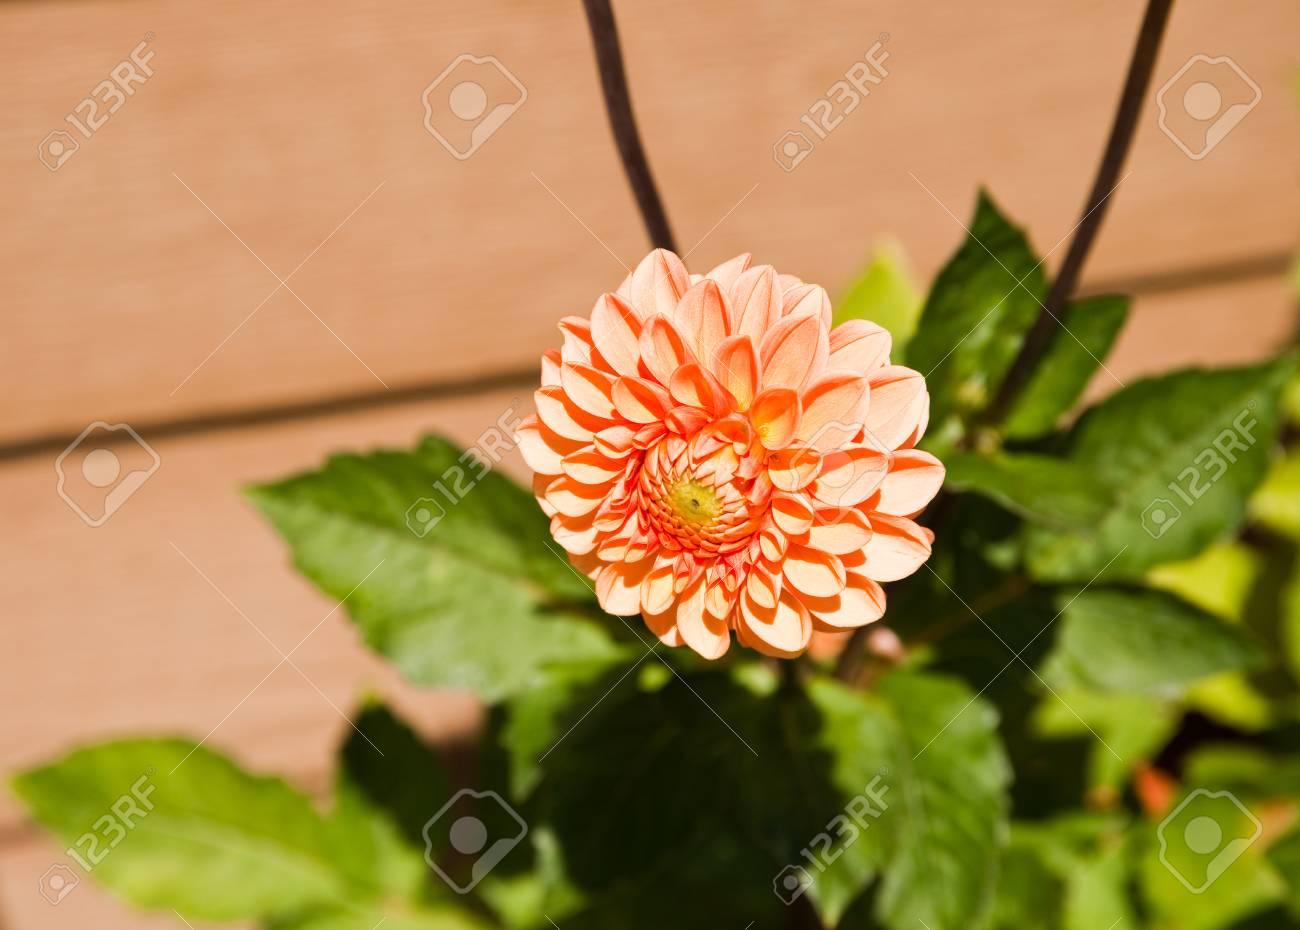 Sunlit flower in a garden - 89407571